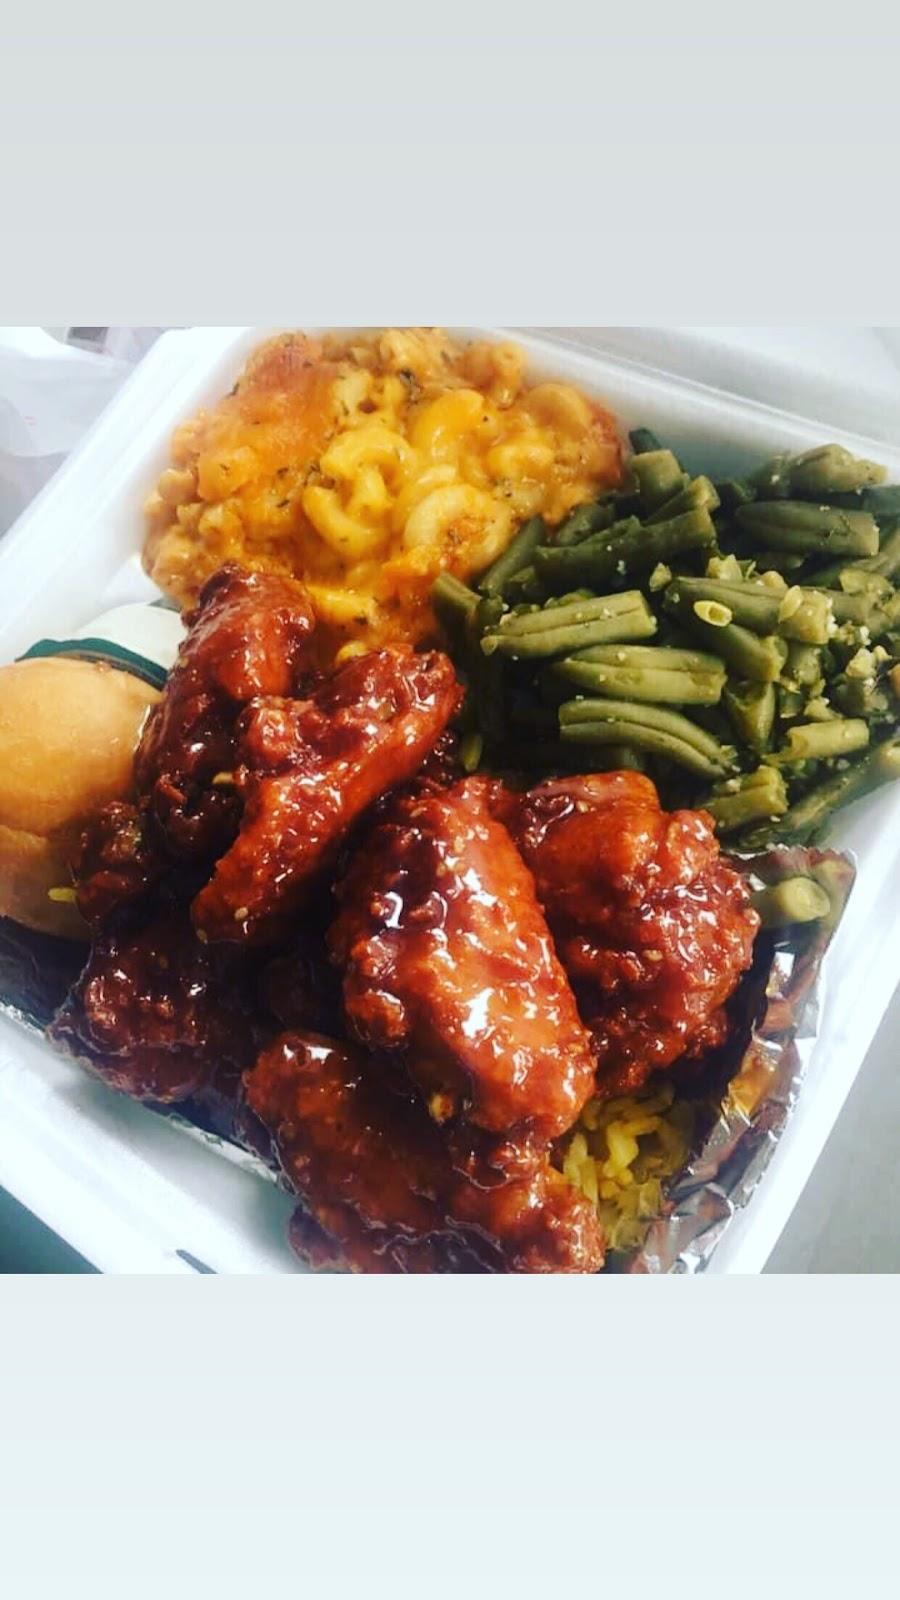 Cleveland's Concessions LLC   restaurant   6395 Hiram Douglasville Hwy, Powder Springs, GA 30127, USA